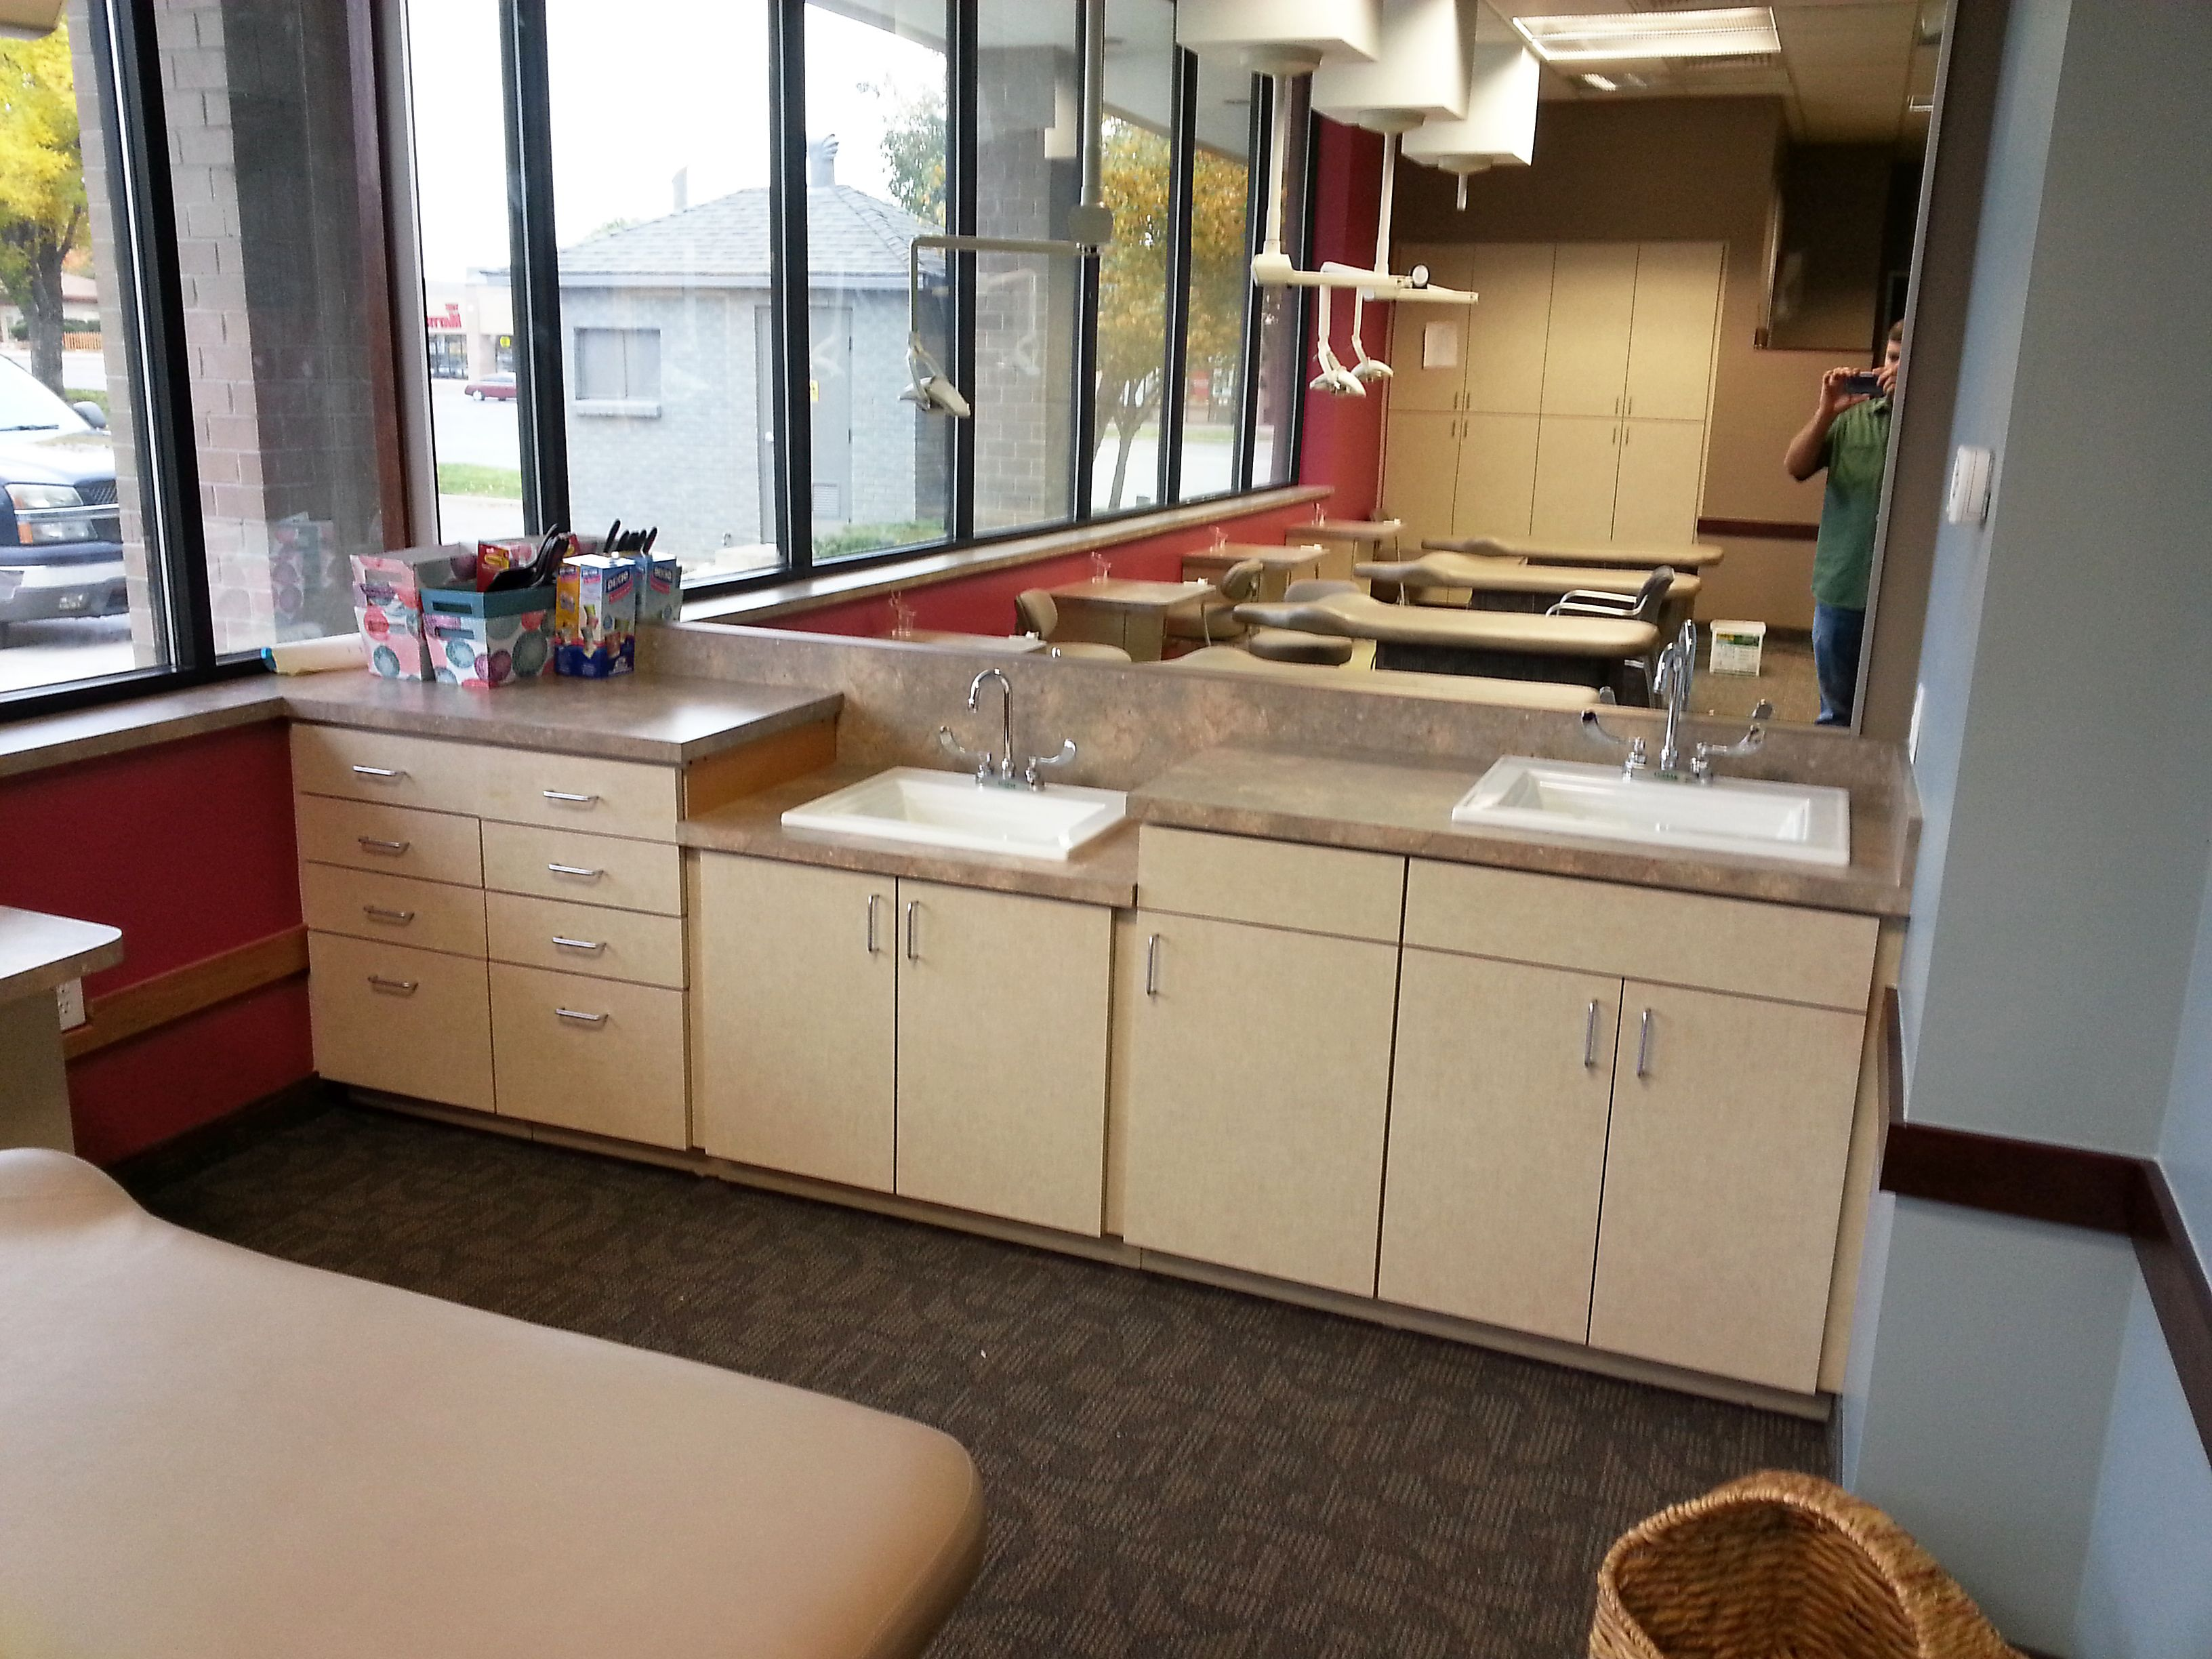 Custom Laminate Cabinets U0026 Countertops: Flax Gauze, Roundover Edge, Self  Edge Slab Door W/ White Melamine Interior, Framless Boxes